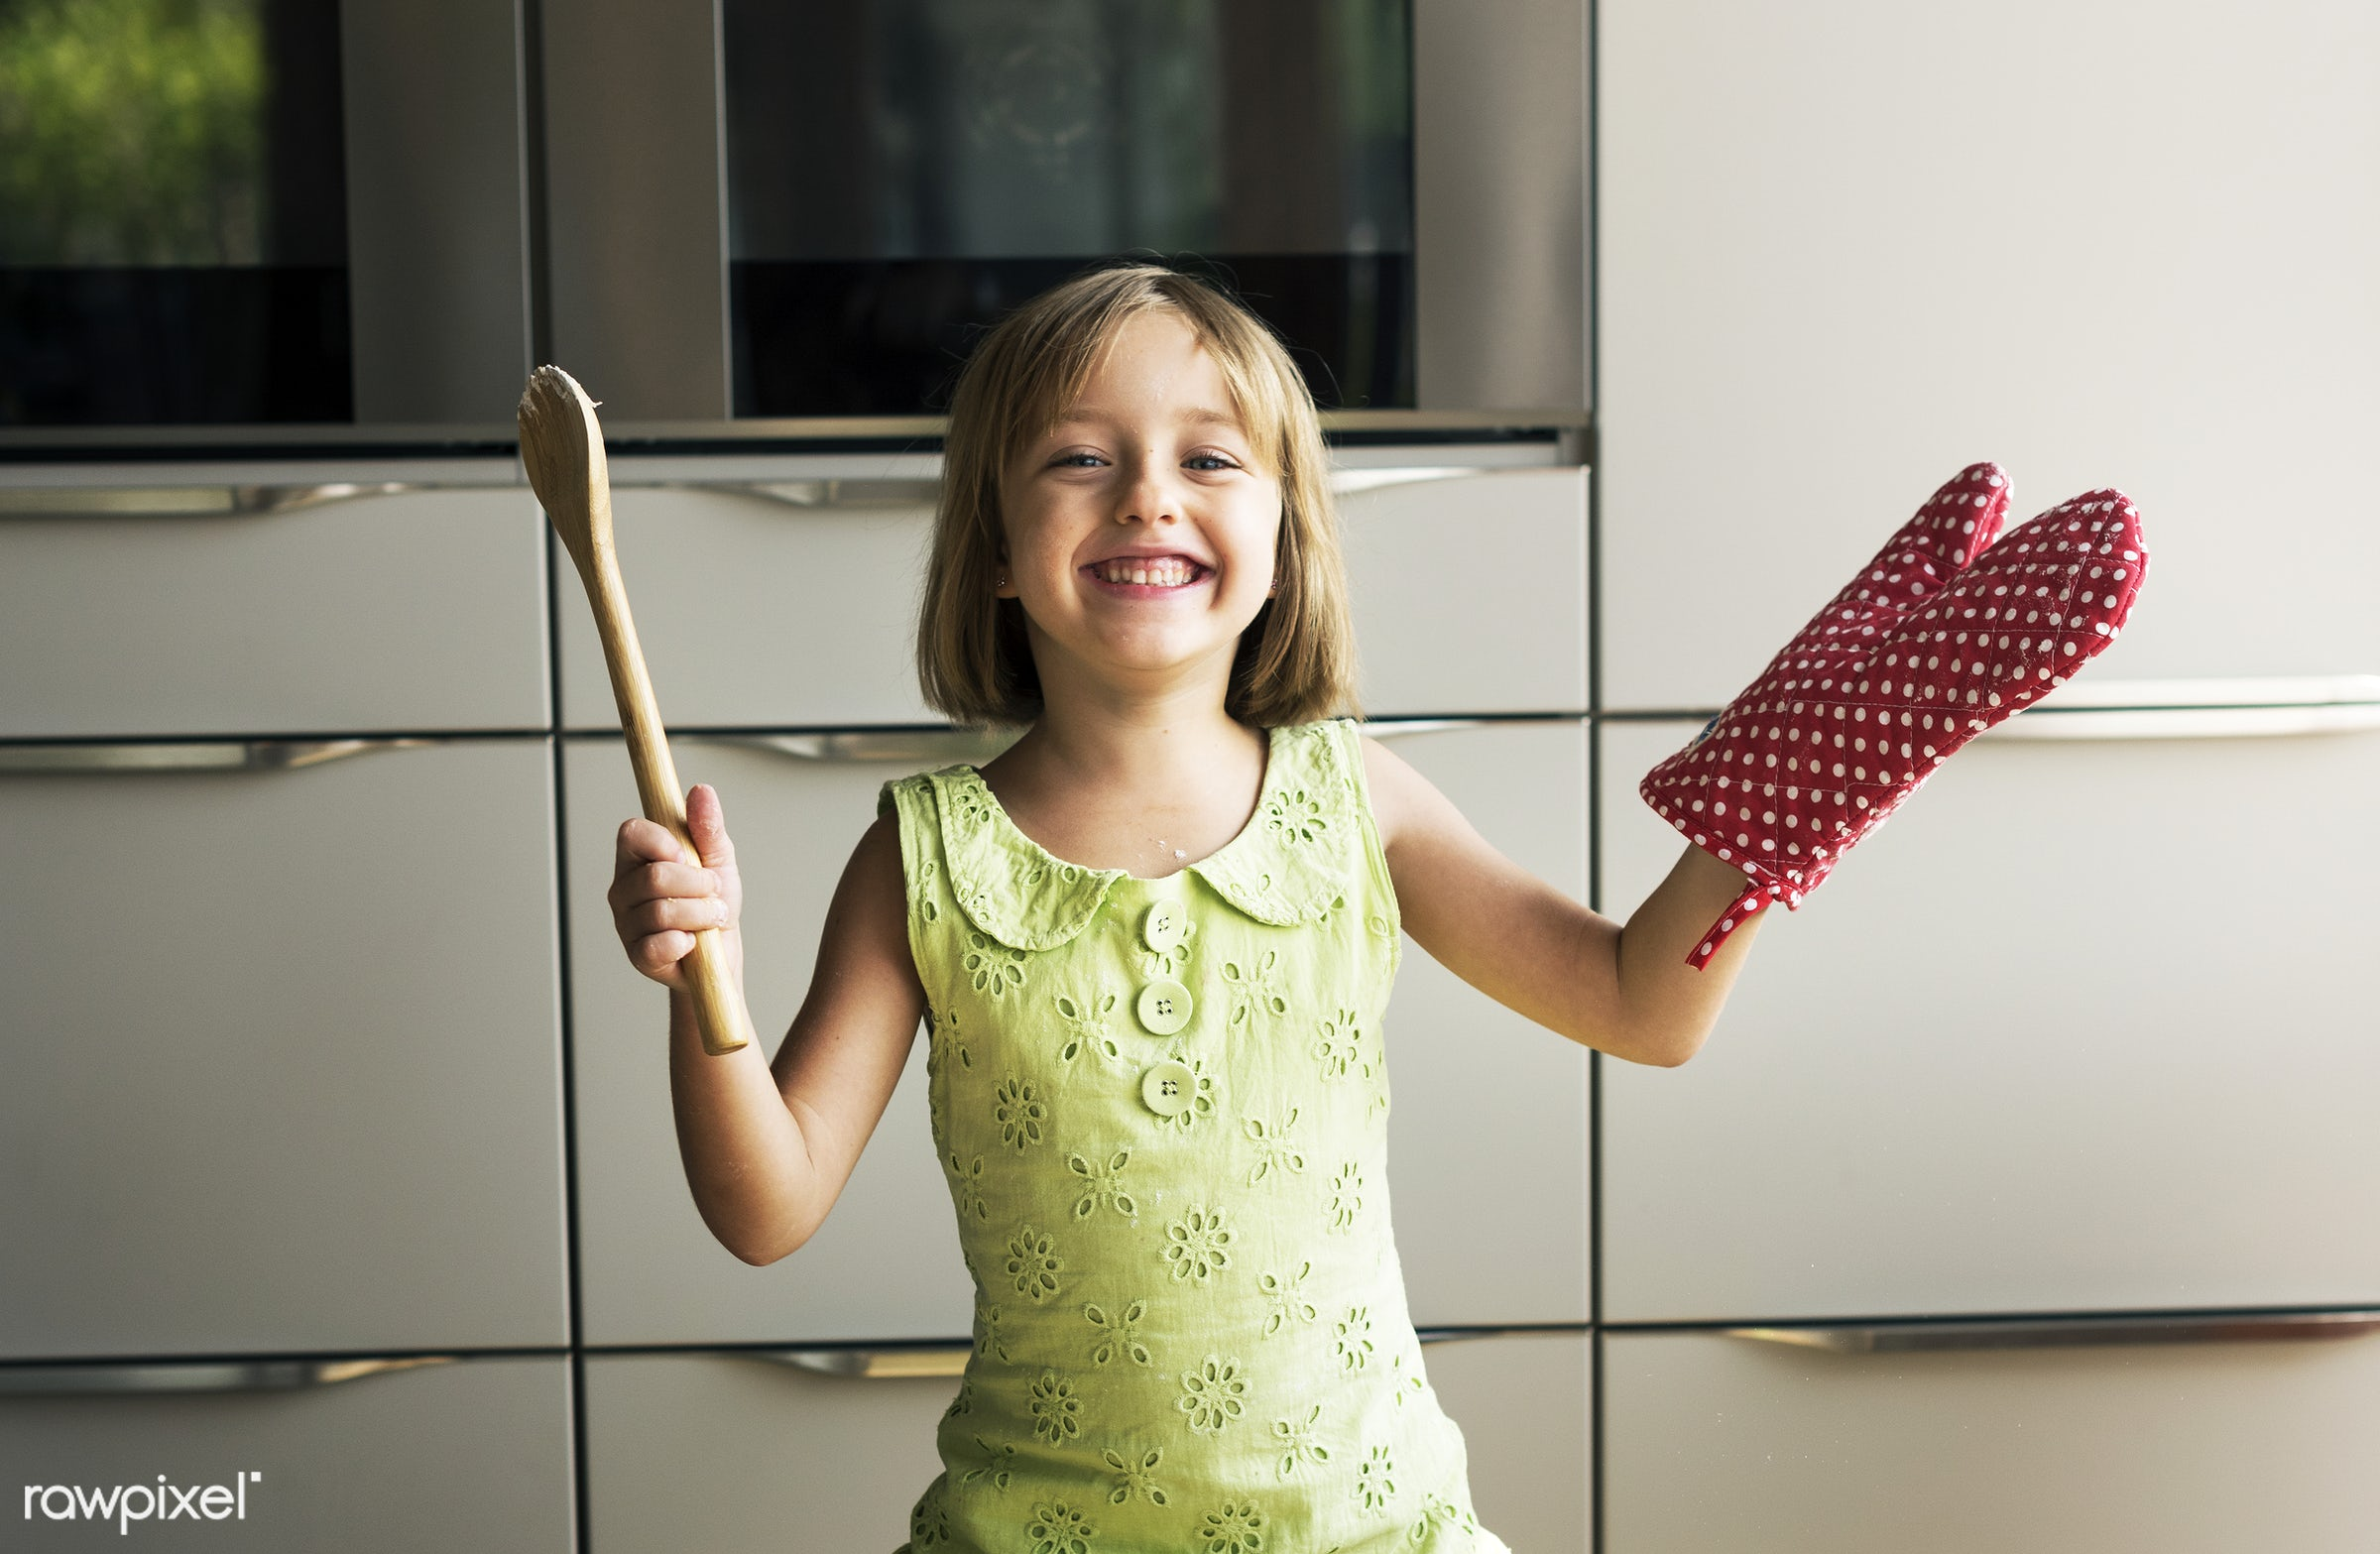 equipment, activity, alone, american, bake, baker, bakery, baking, blond, caucasian, cheerful, child, children, cook, cookie...